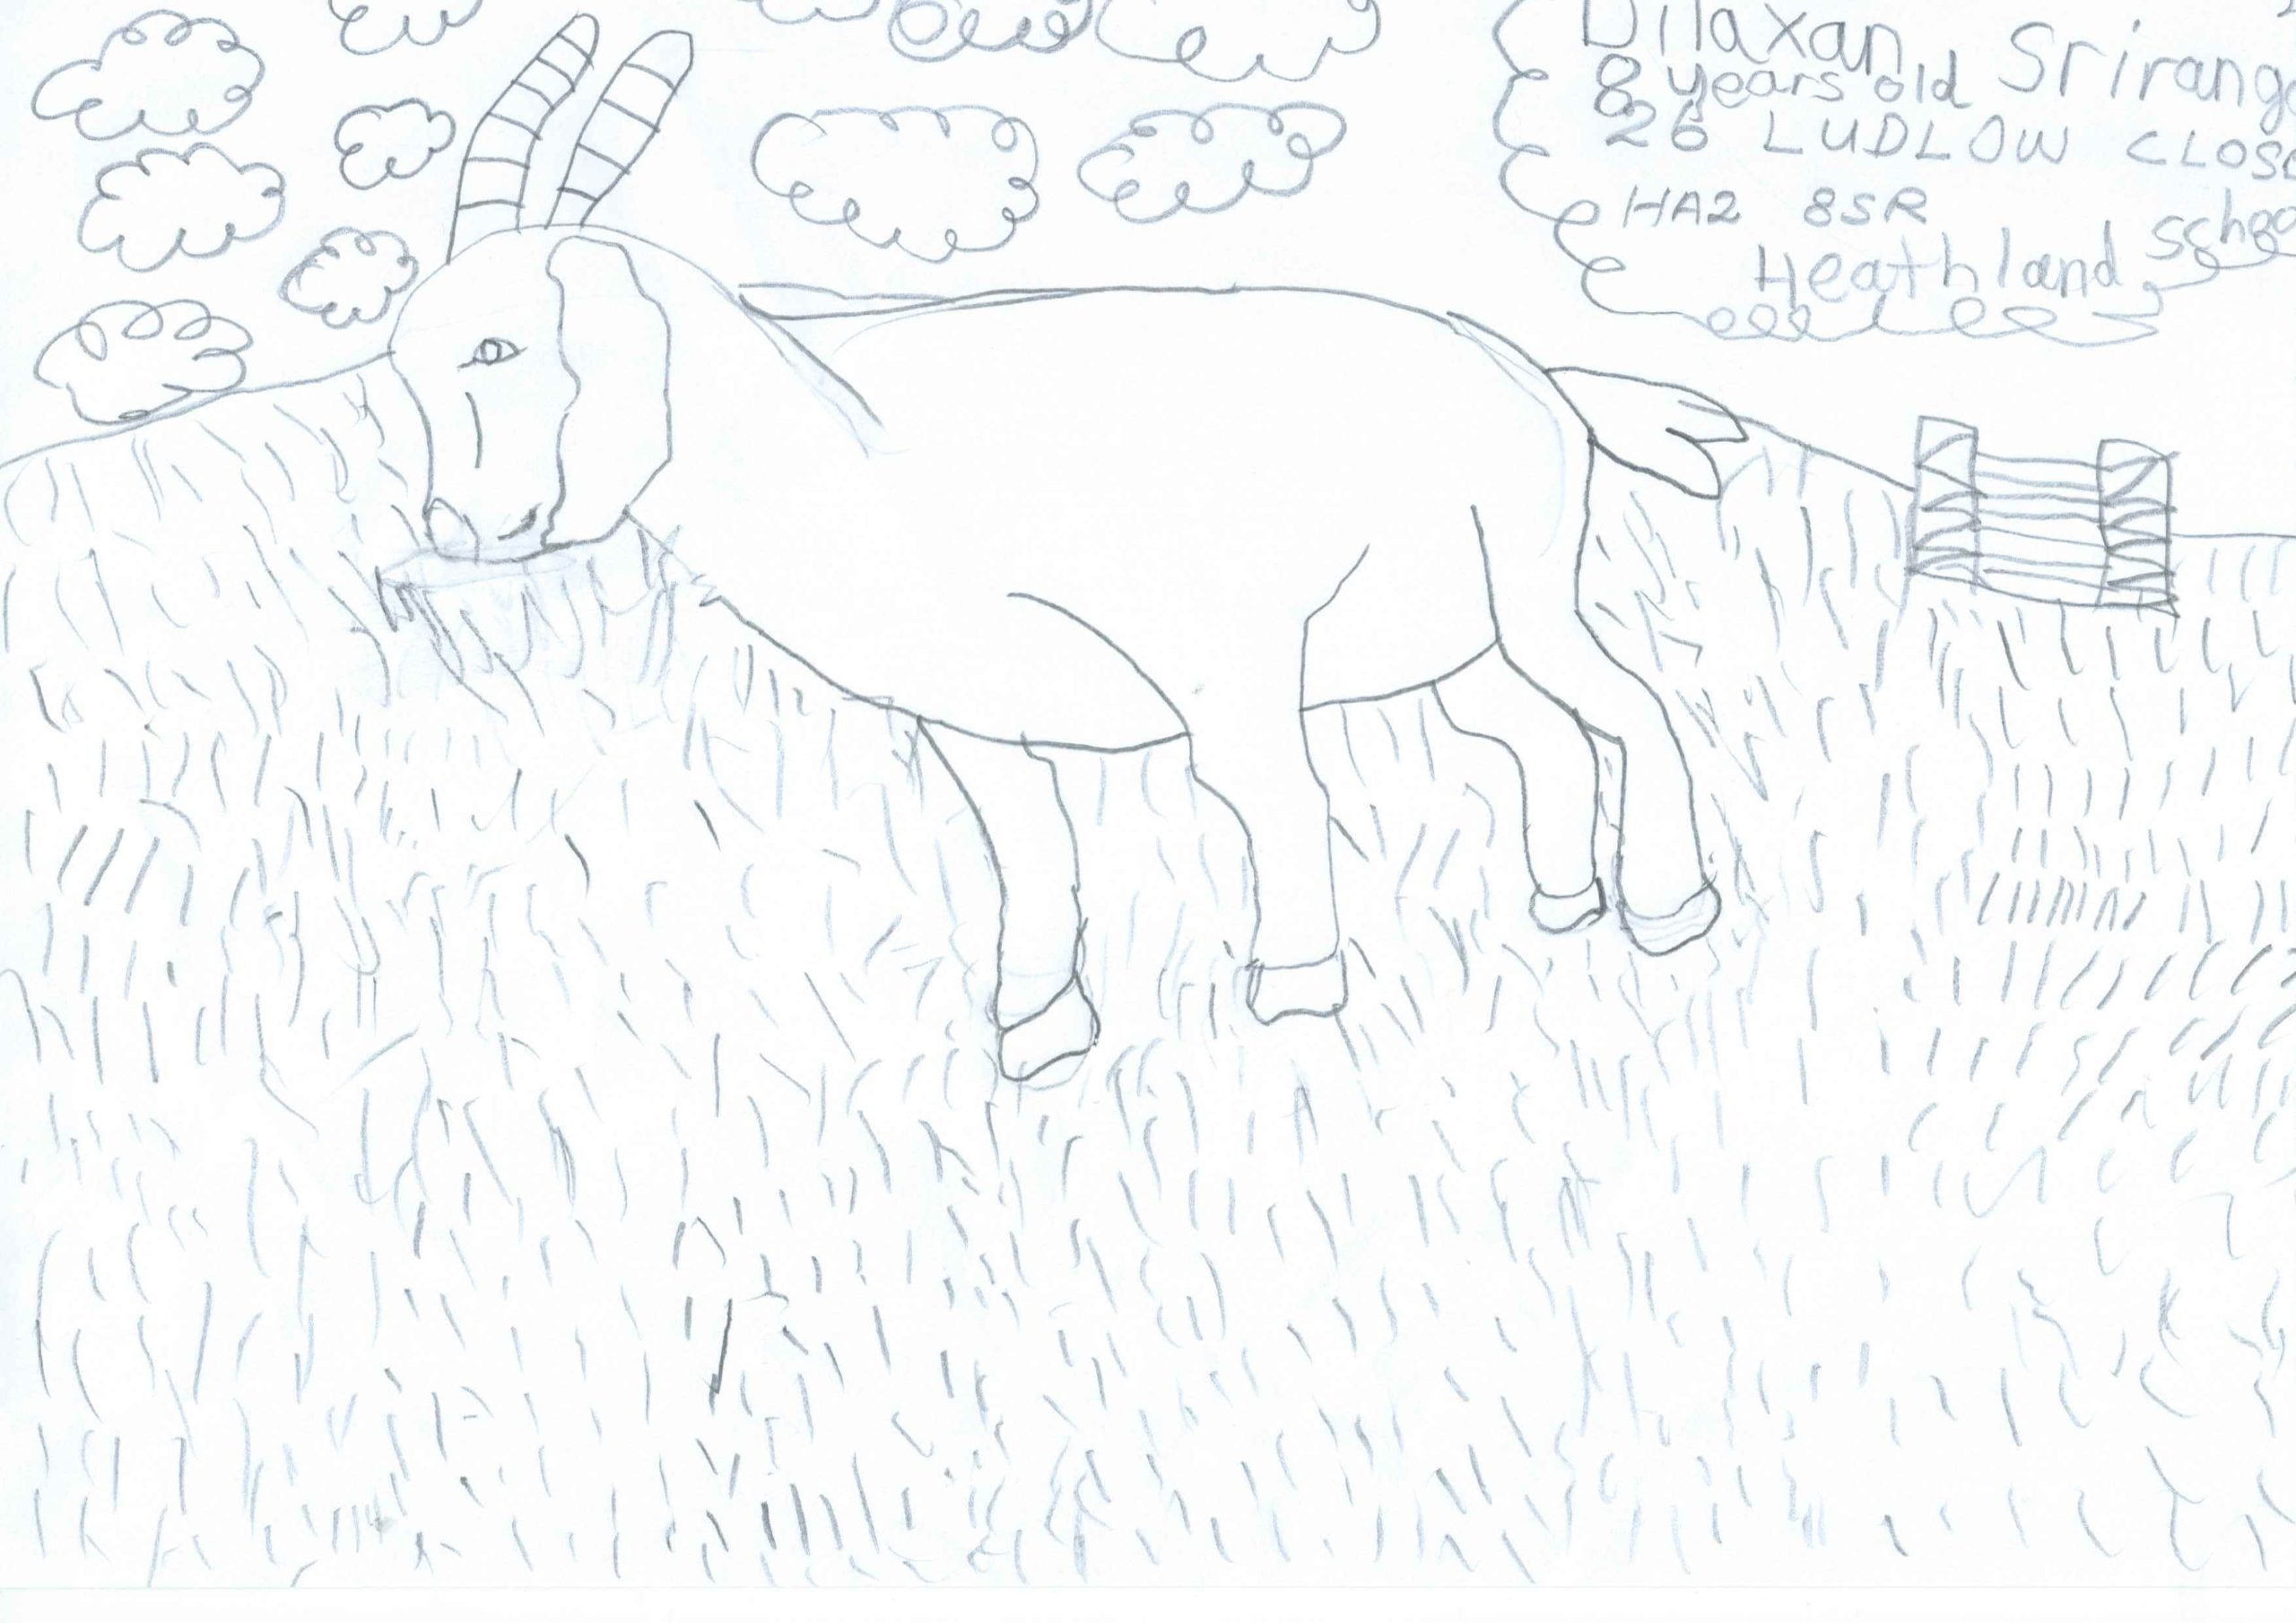 Dilaxan Srirangan, Age 8